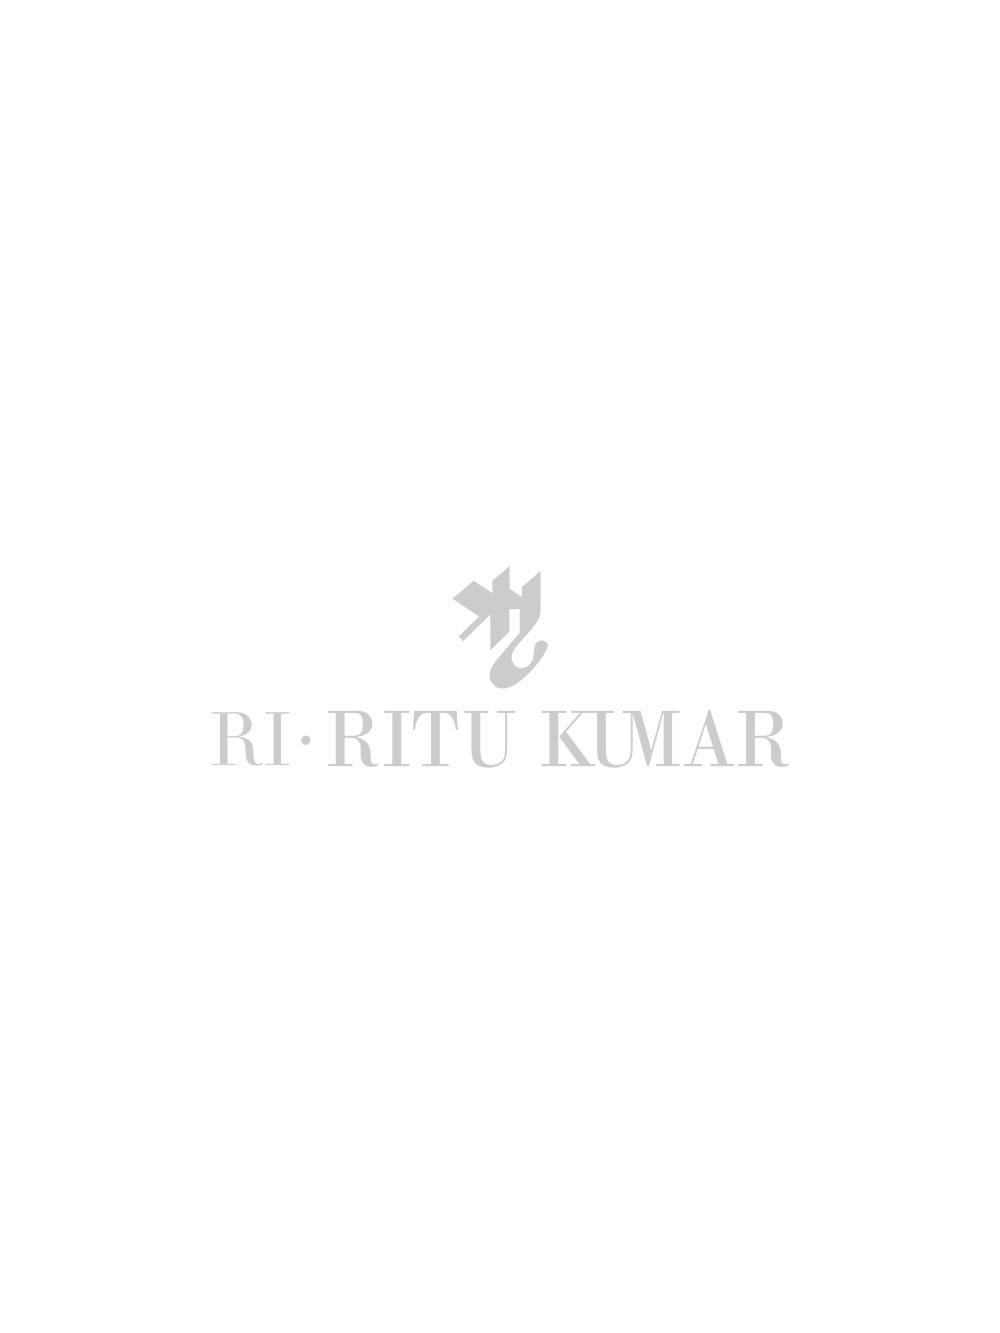 Off White Embroidered Kurti